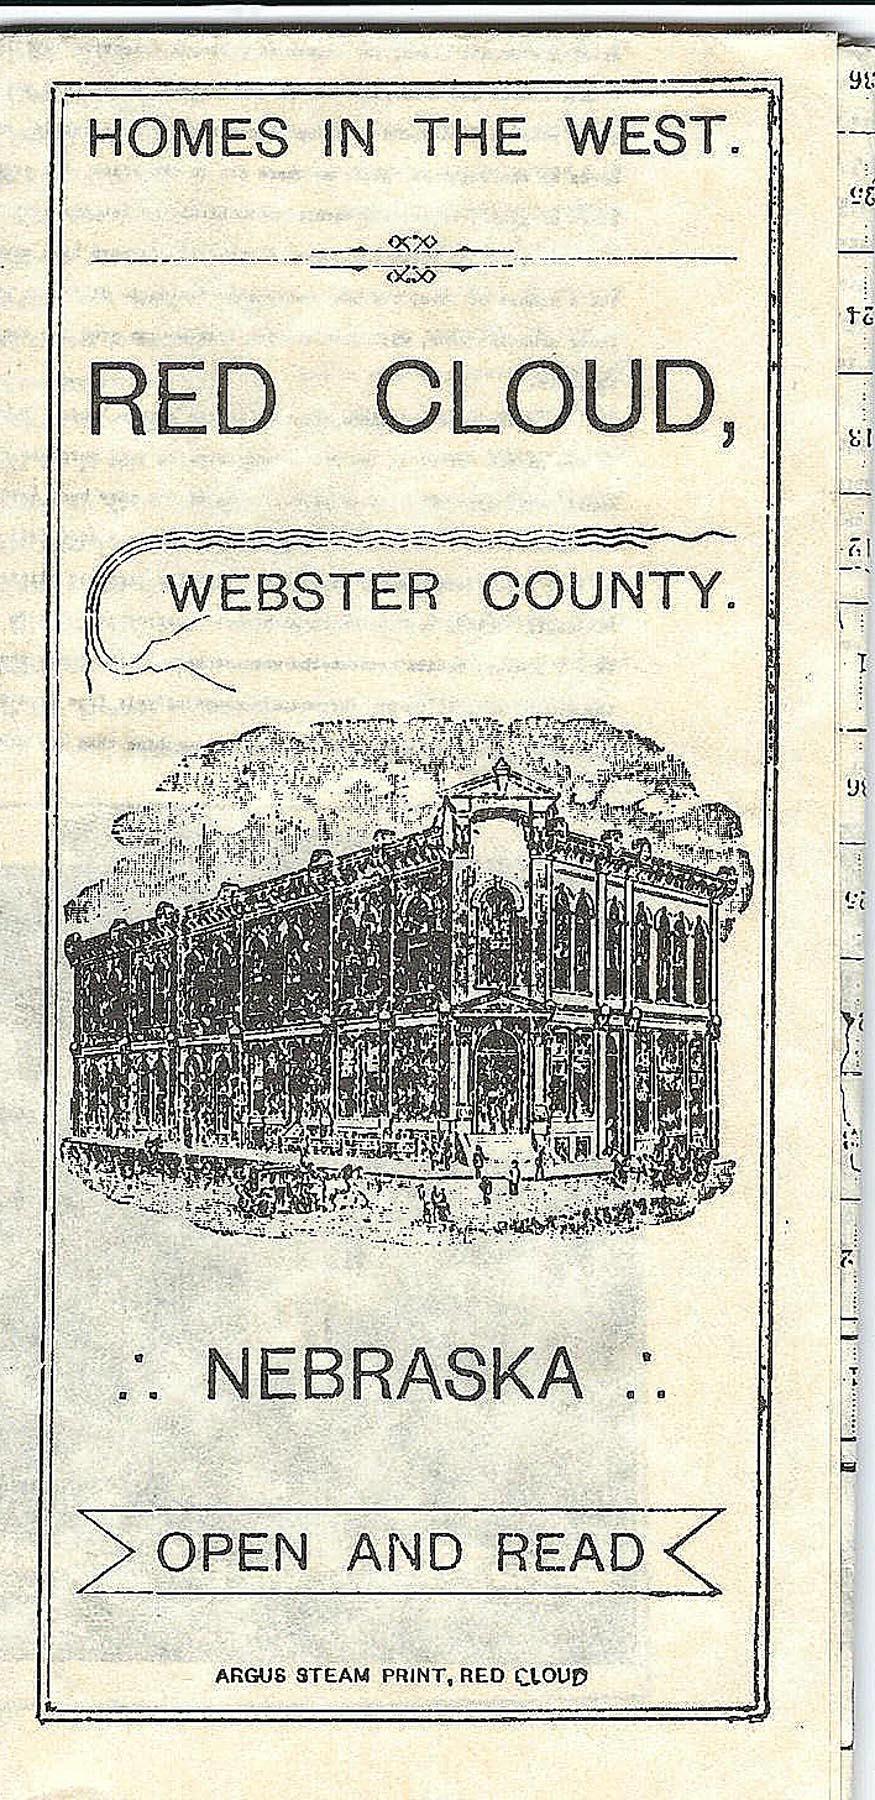 Settlement Brochure for Red Cloud